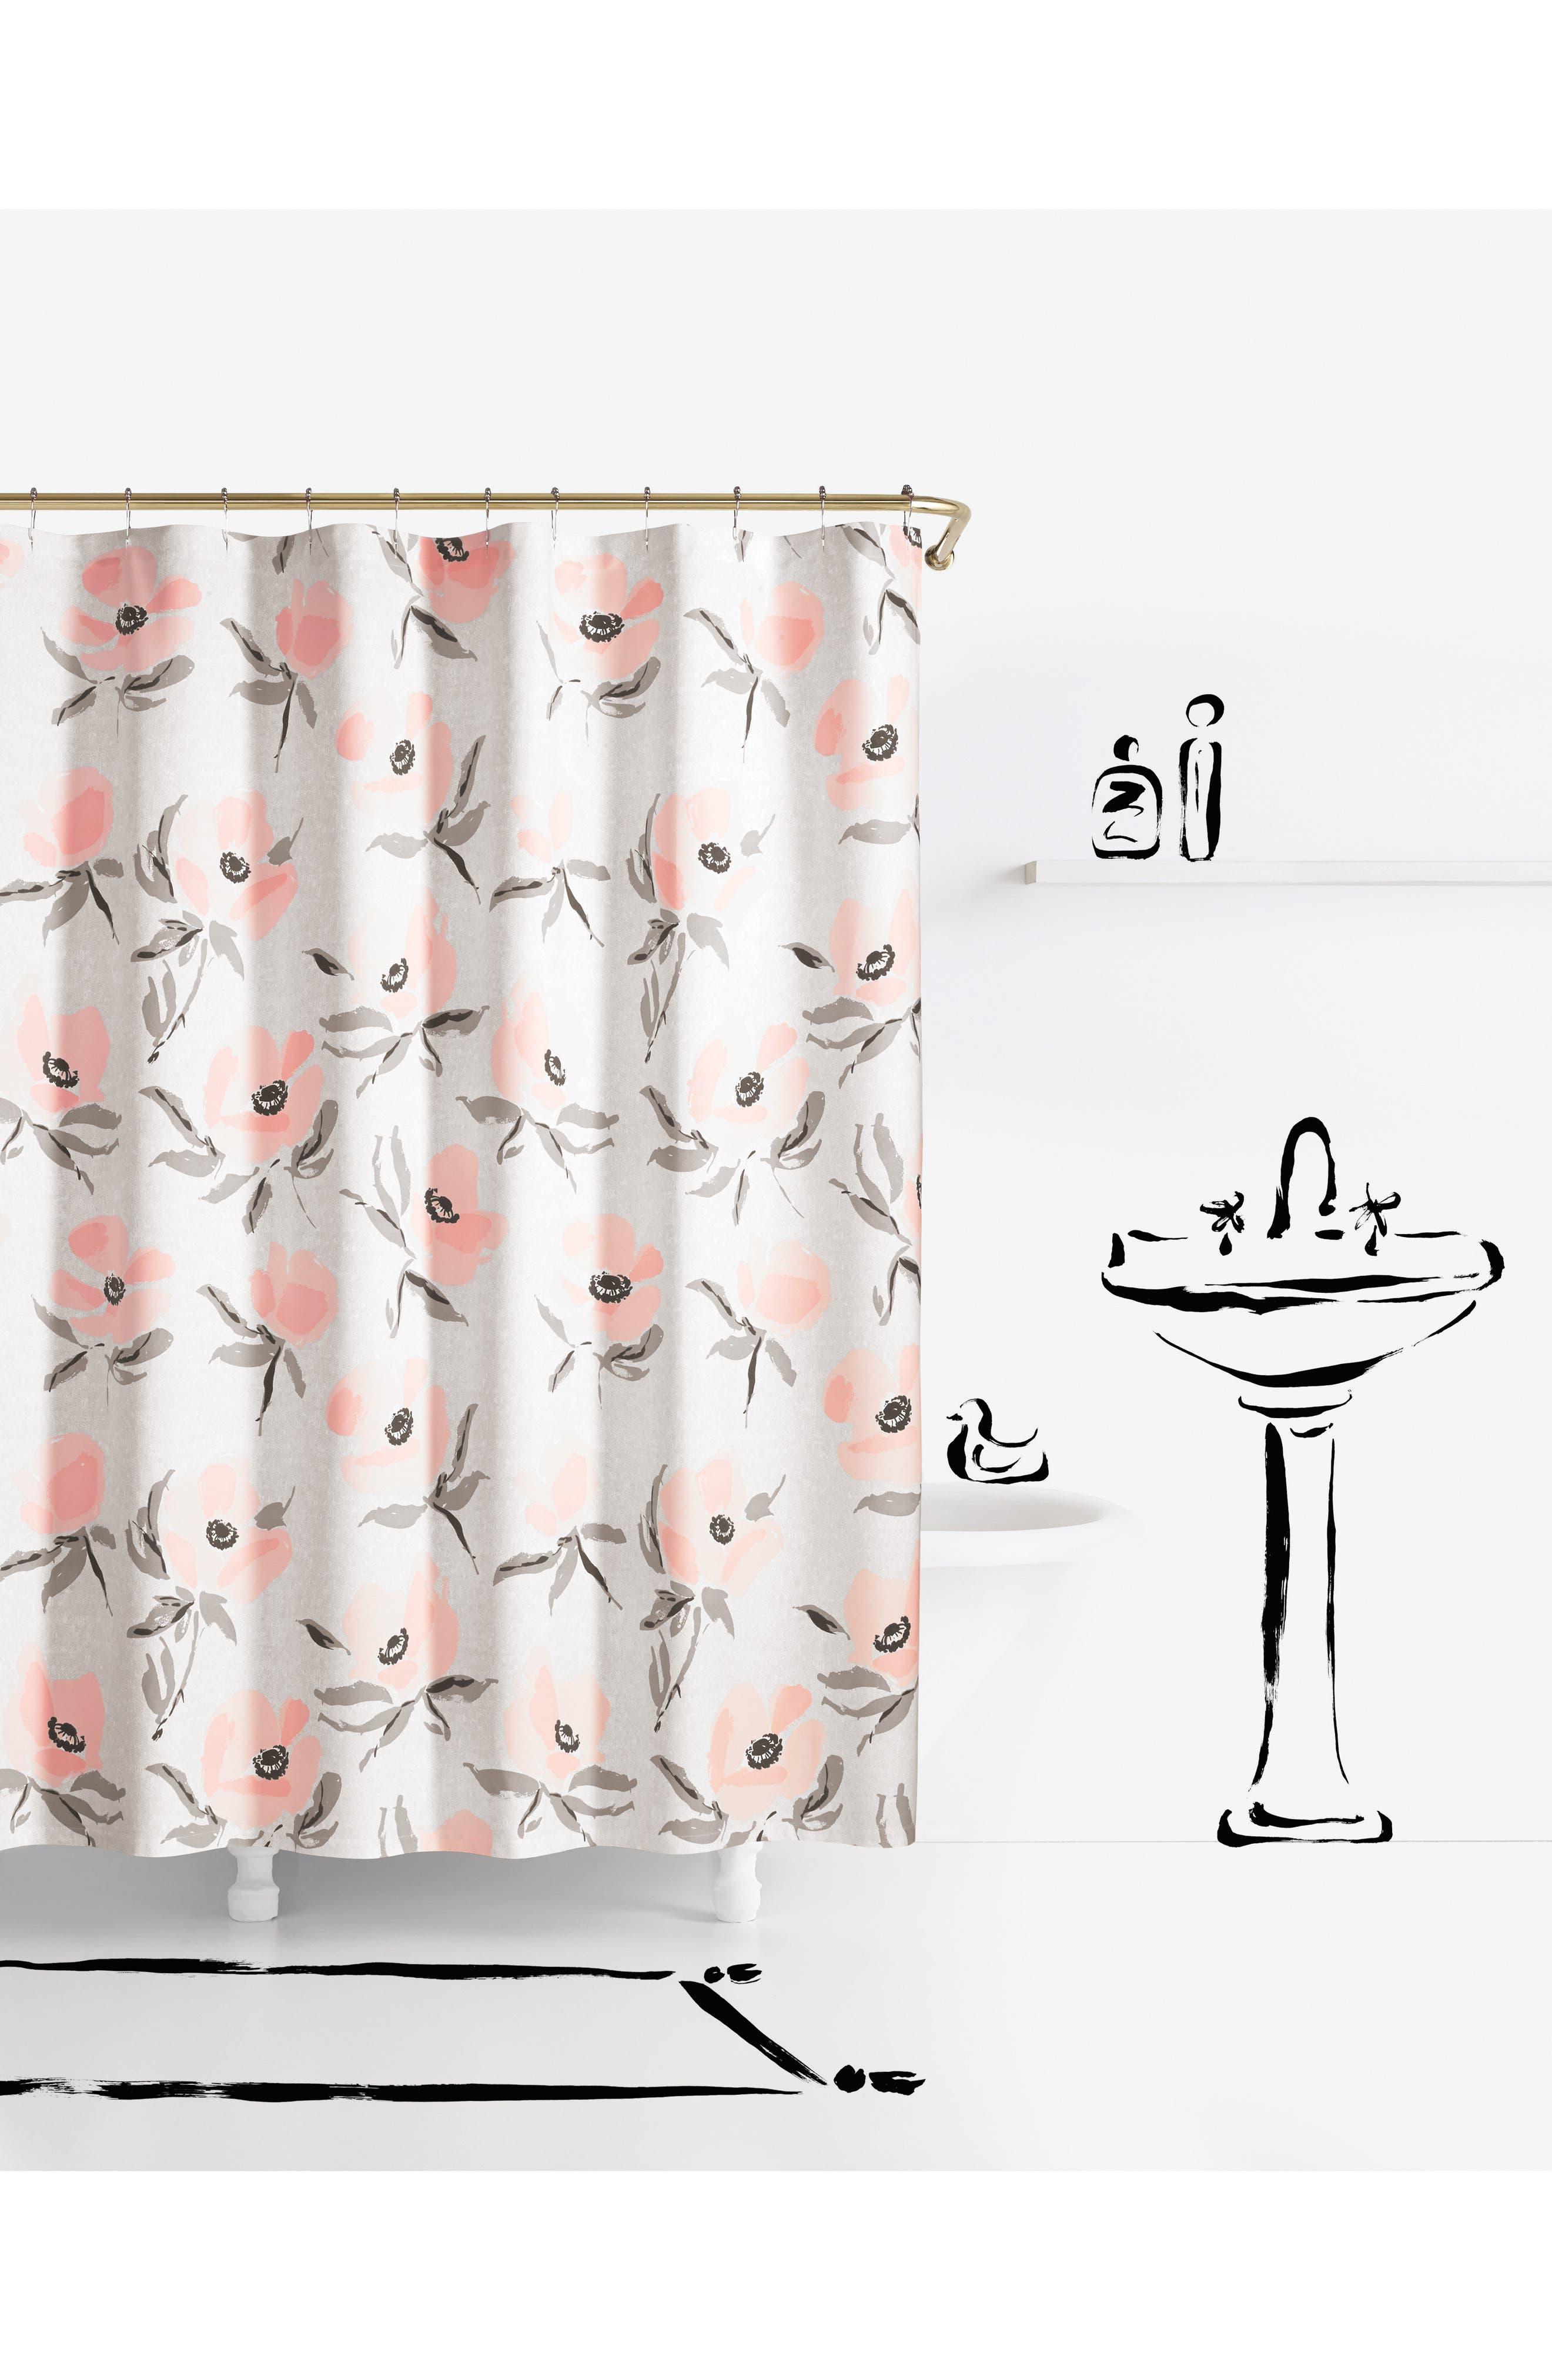 Elegant Kate Spade New York Poppies Shower Curtain